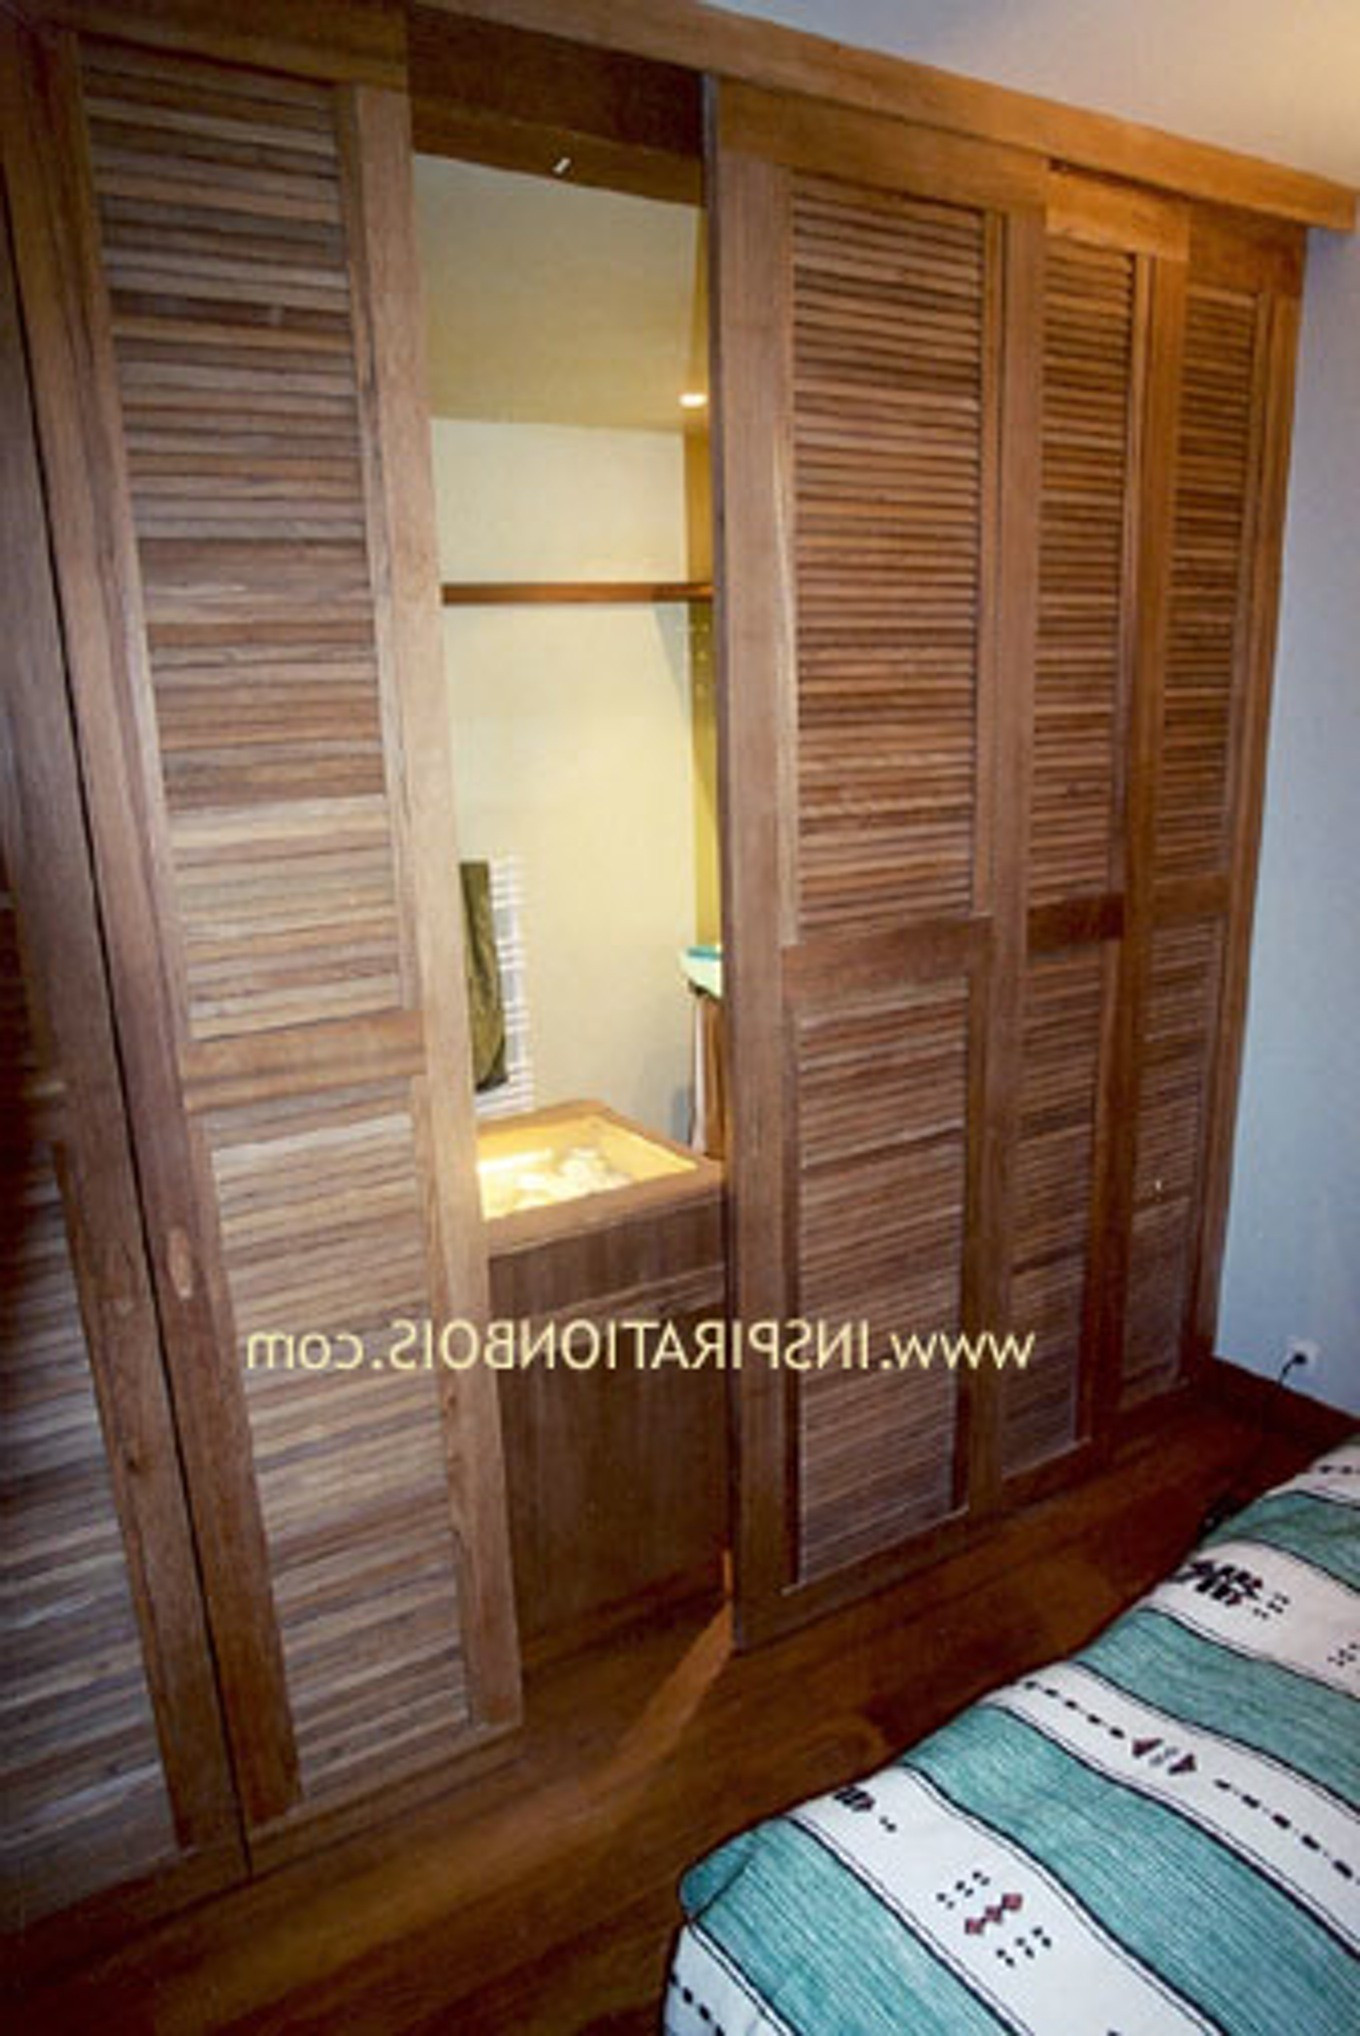 pvc hardwood flooring of fenetres coulissantes castorama luxury cloison coulissante japonaise for information